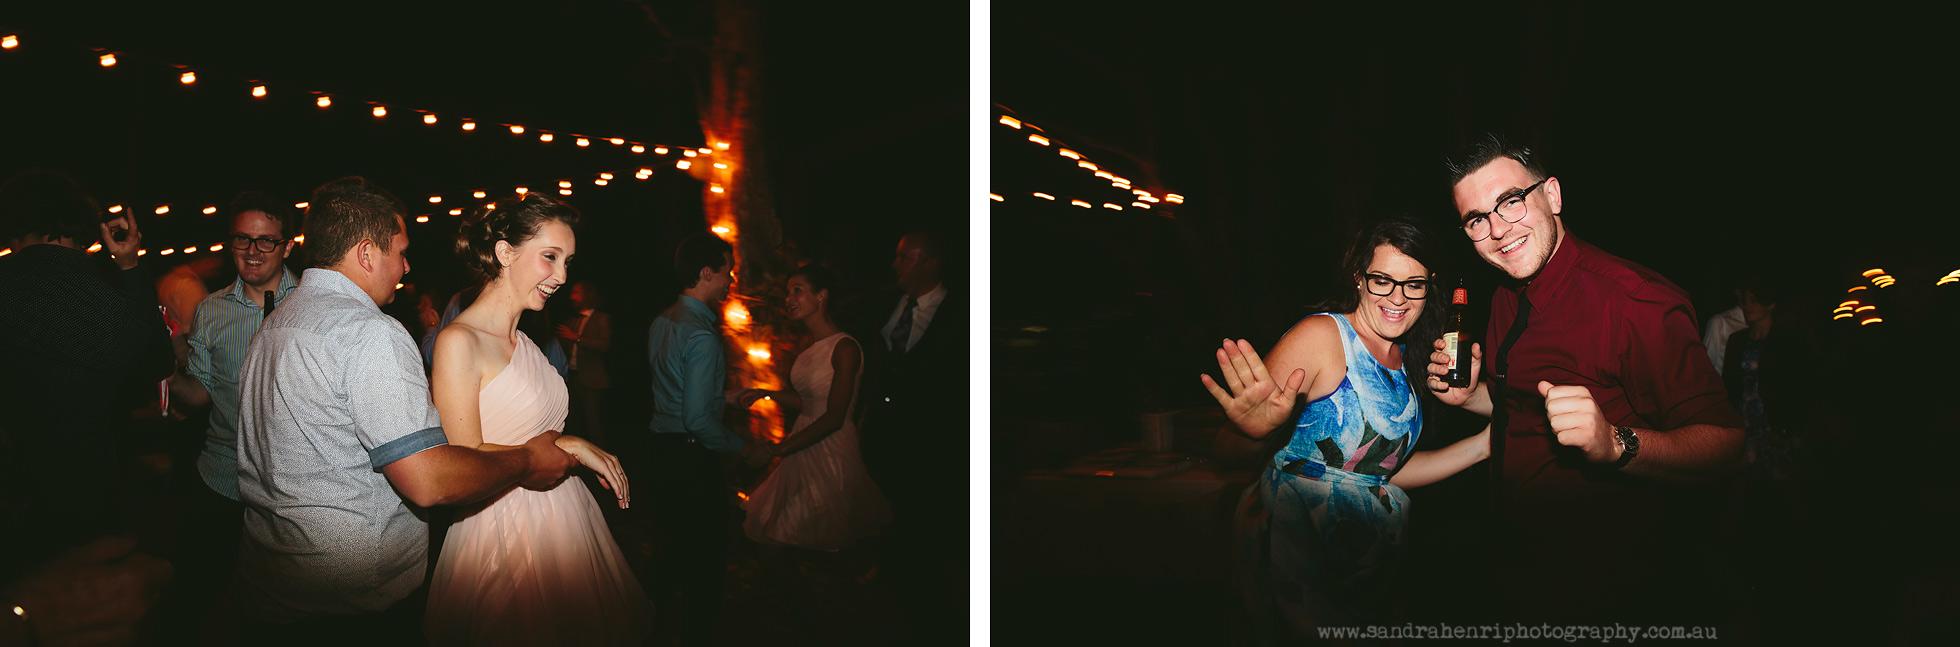 Port-Stephens-Wedding-Photographer-Central-Coast-47.jpg